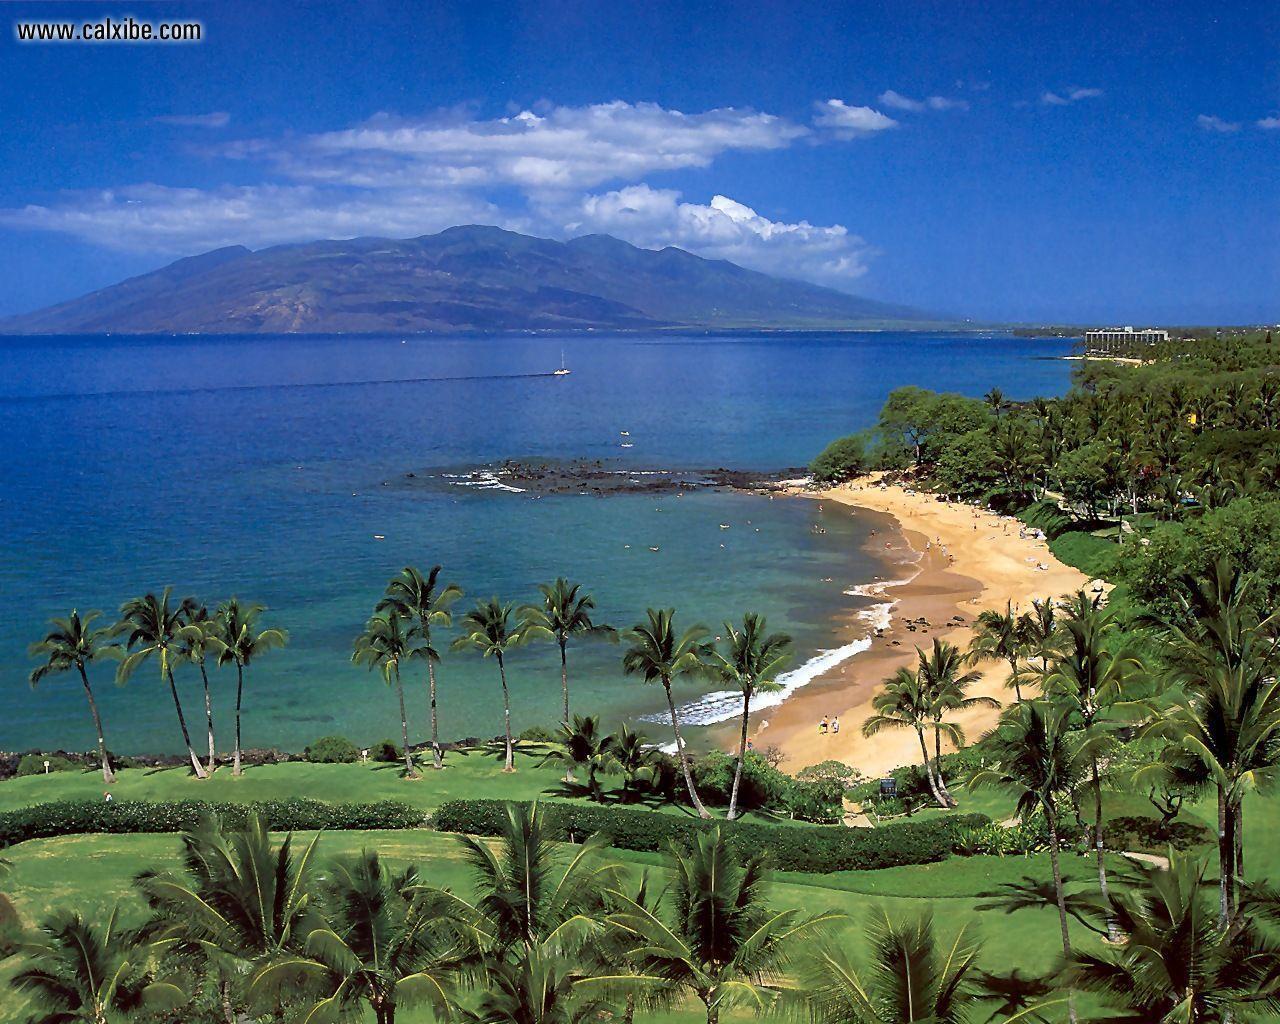 Hd Tropical Island Beach Paradise Wallpapers And Backgrounds: Tropical Beach Wallpapers Desktop